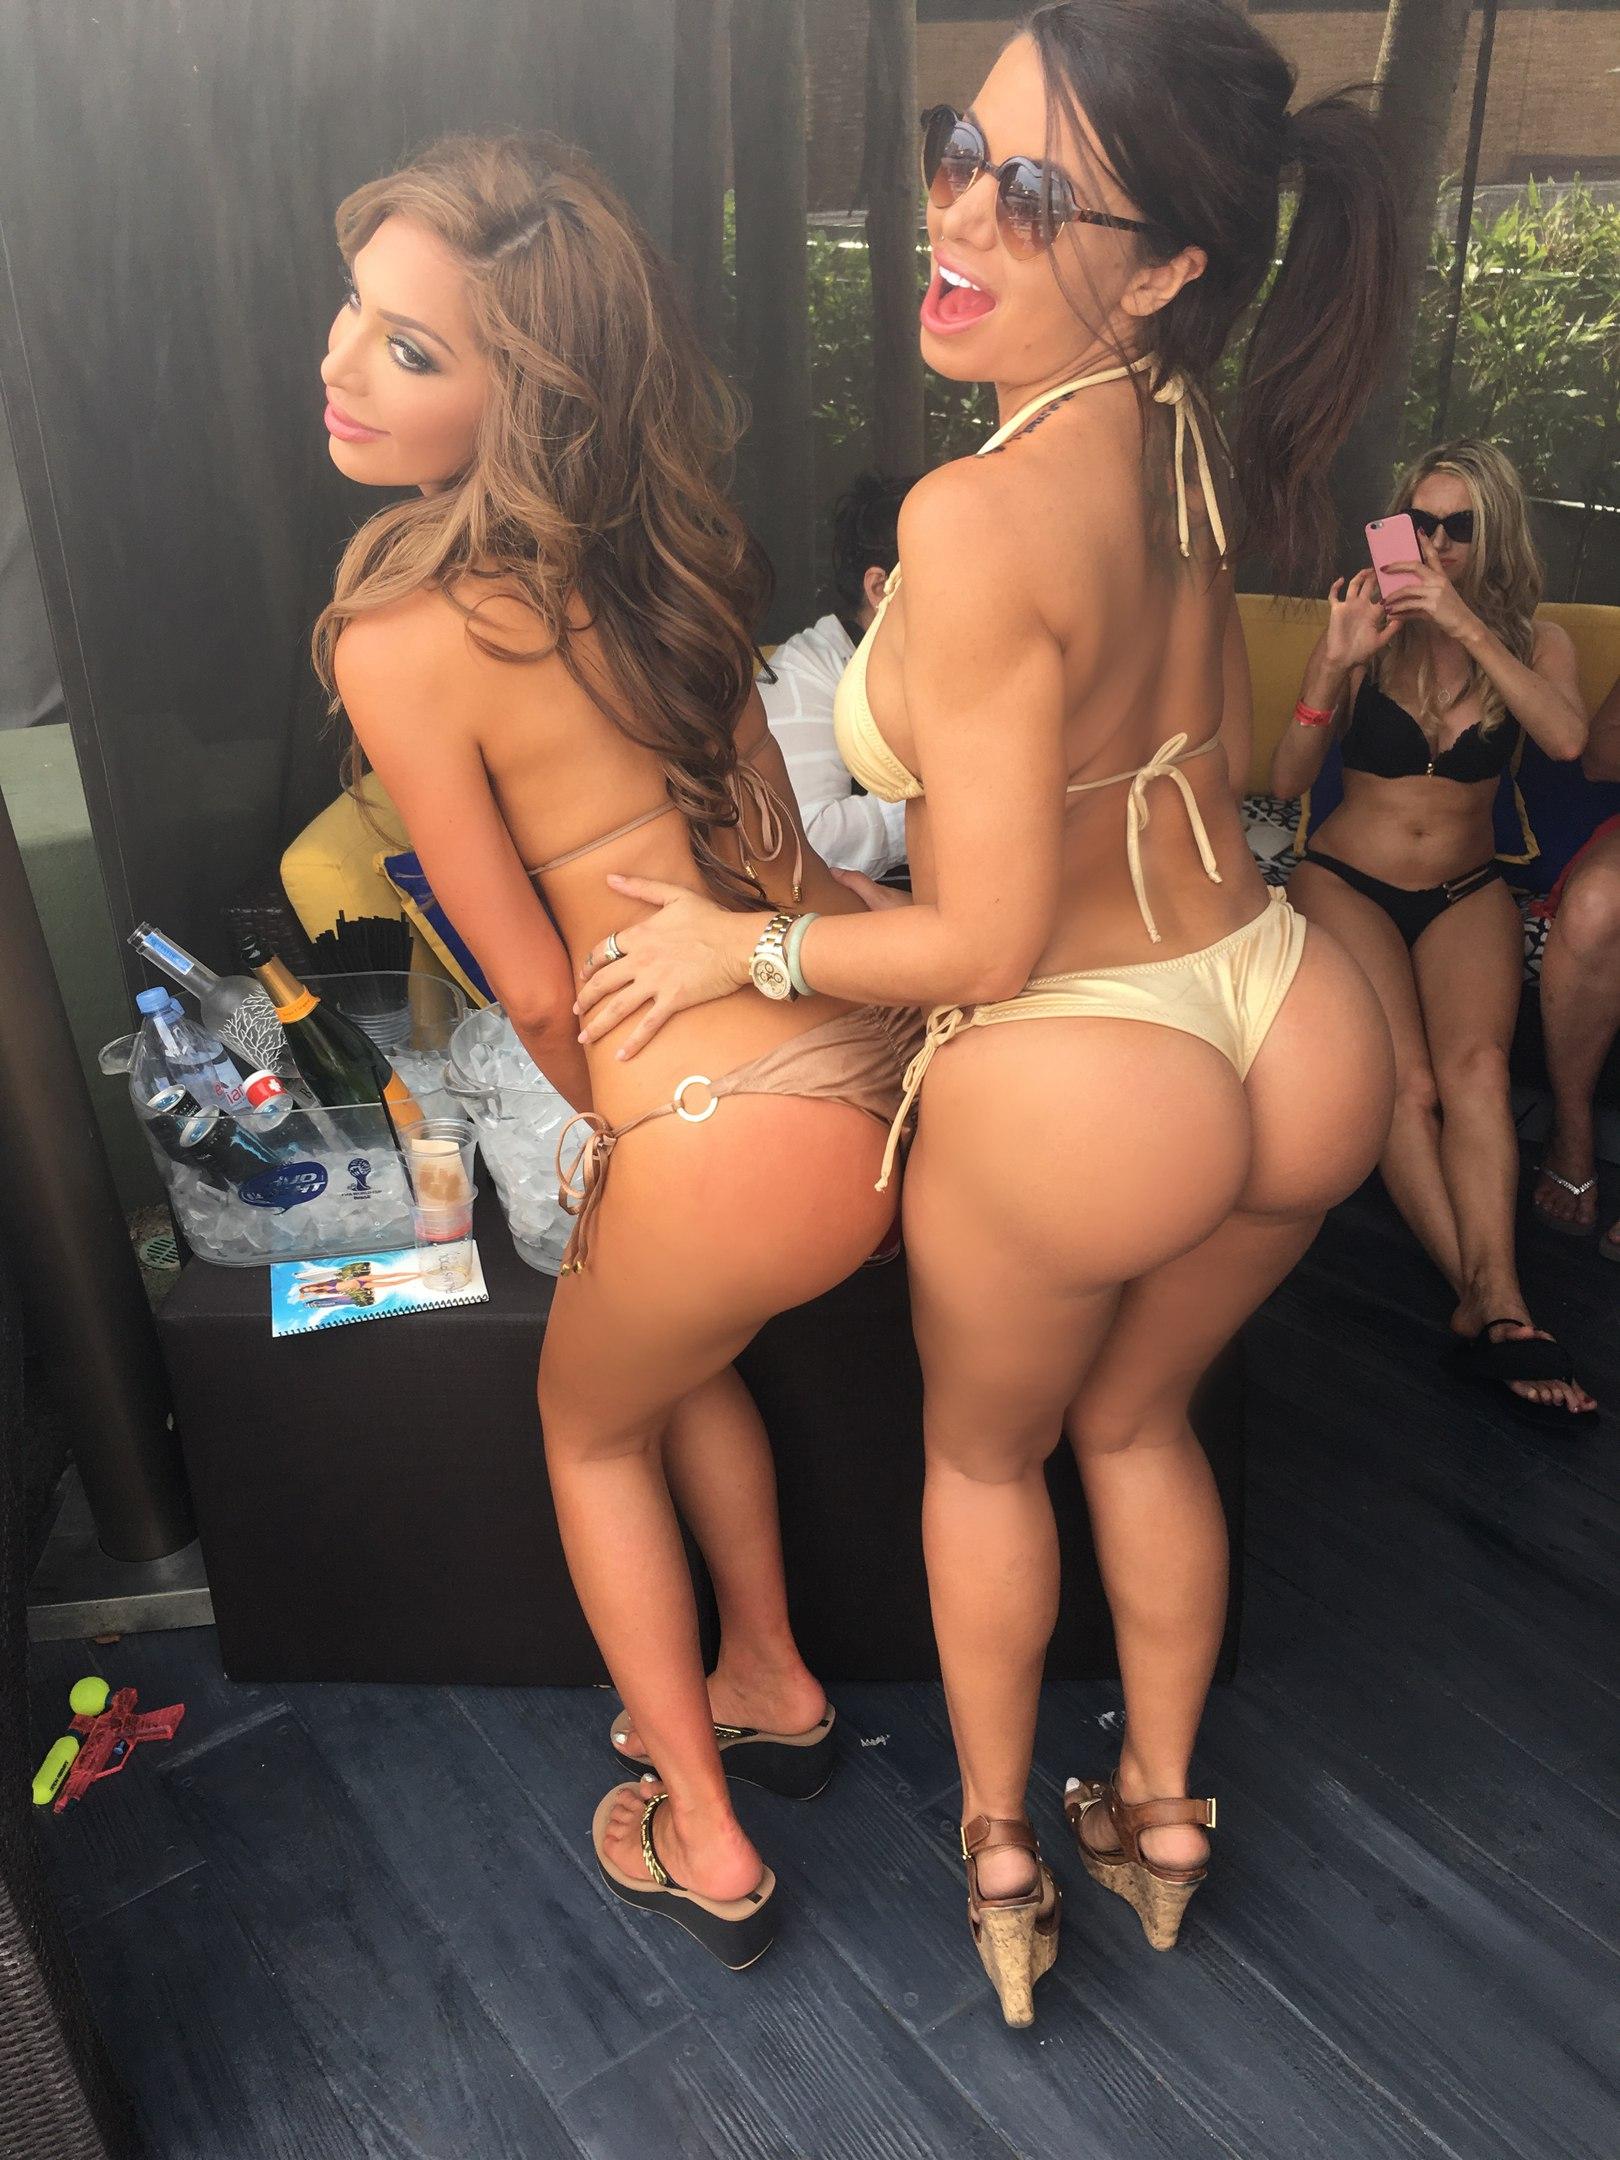 Farrah and friend asses in thongs